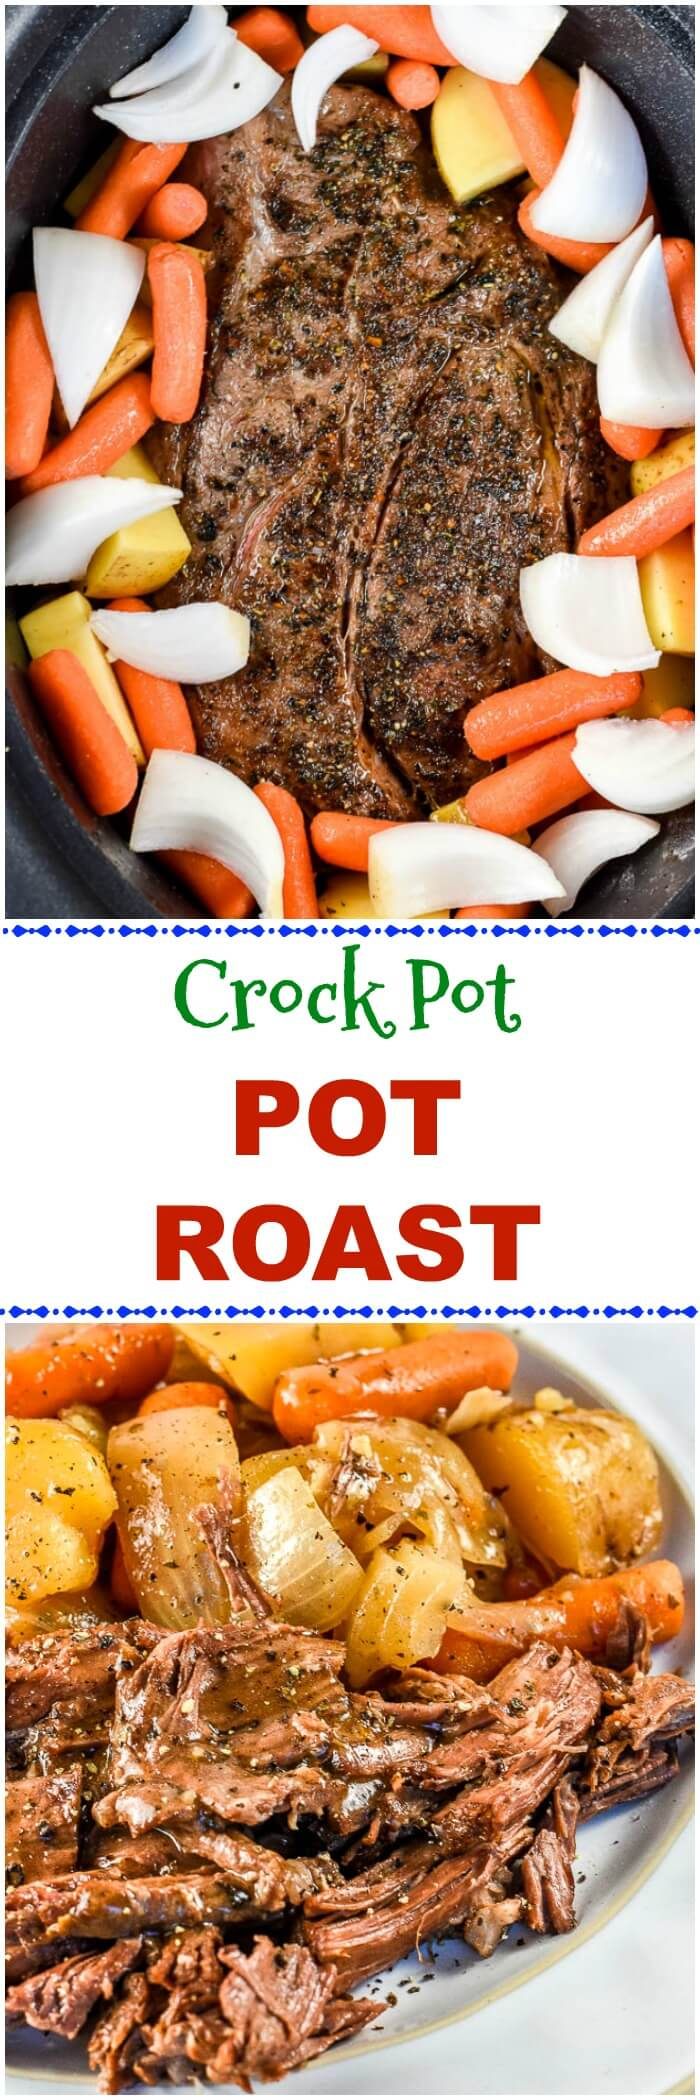 Crock Pot Chuck Roast Pot Roast with Roasted Potatoes and Carrots